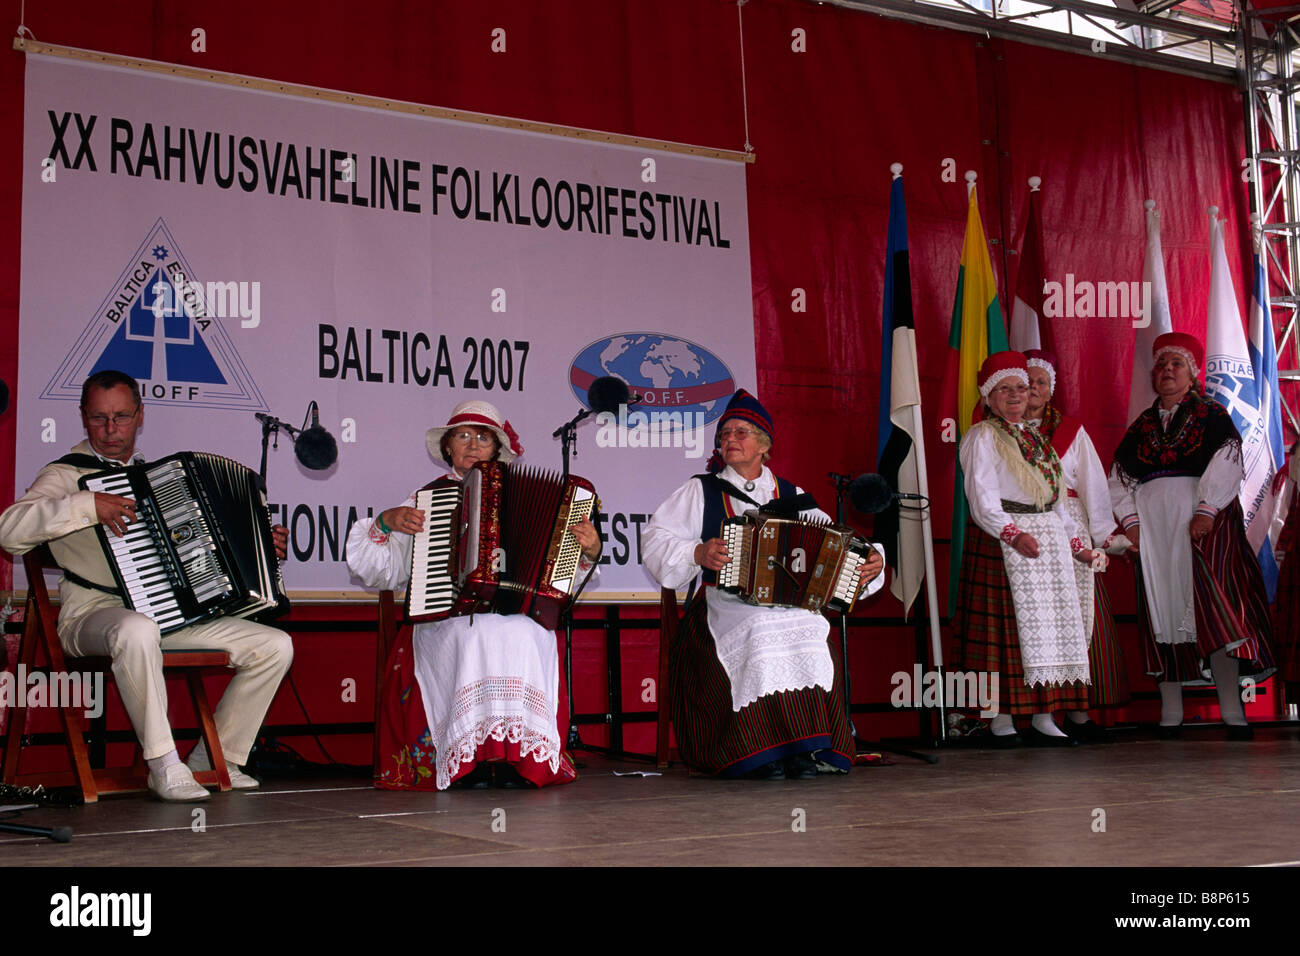 Estonia, Tallinn, Raekoja Plats, mujeres vistiendo ropas tradicionales, báltica 2007 festival de folklore Imagen De Stock